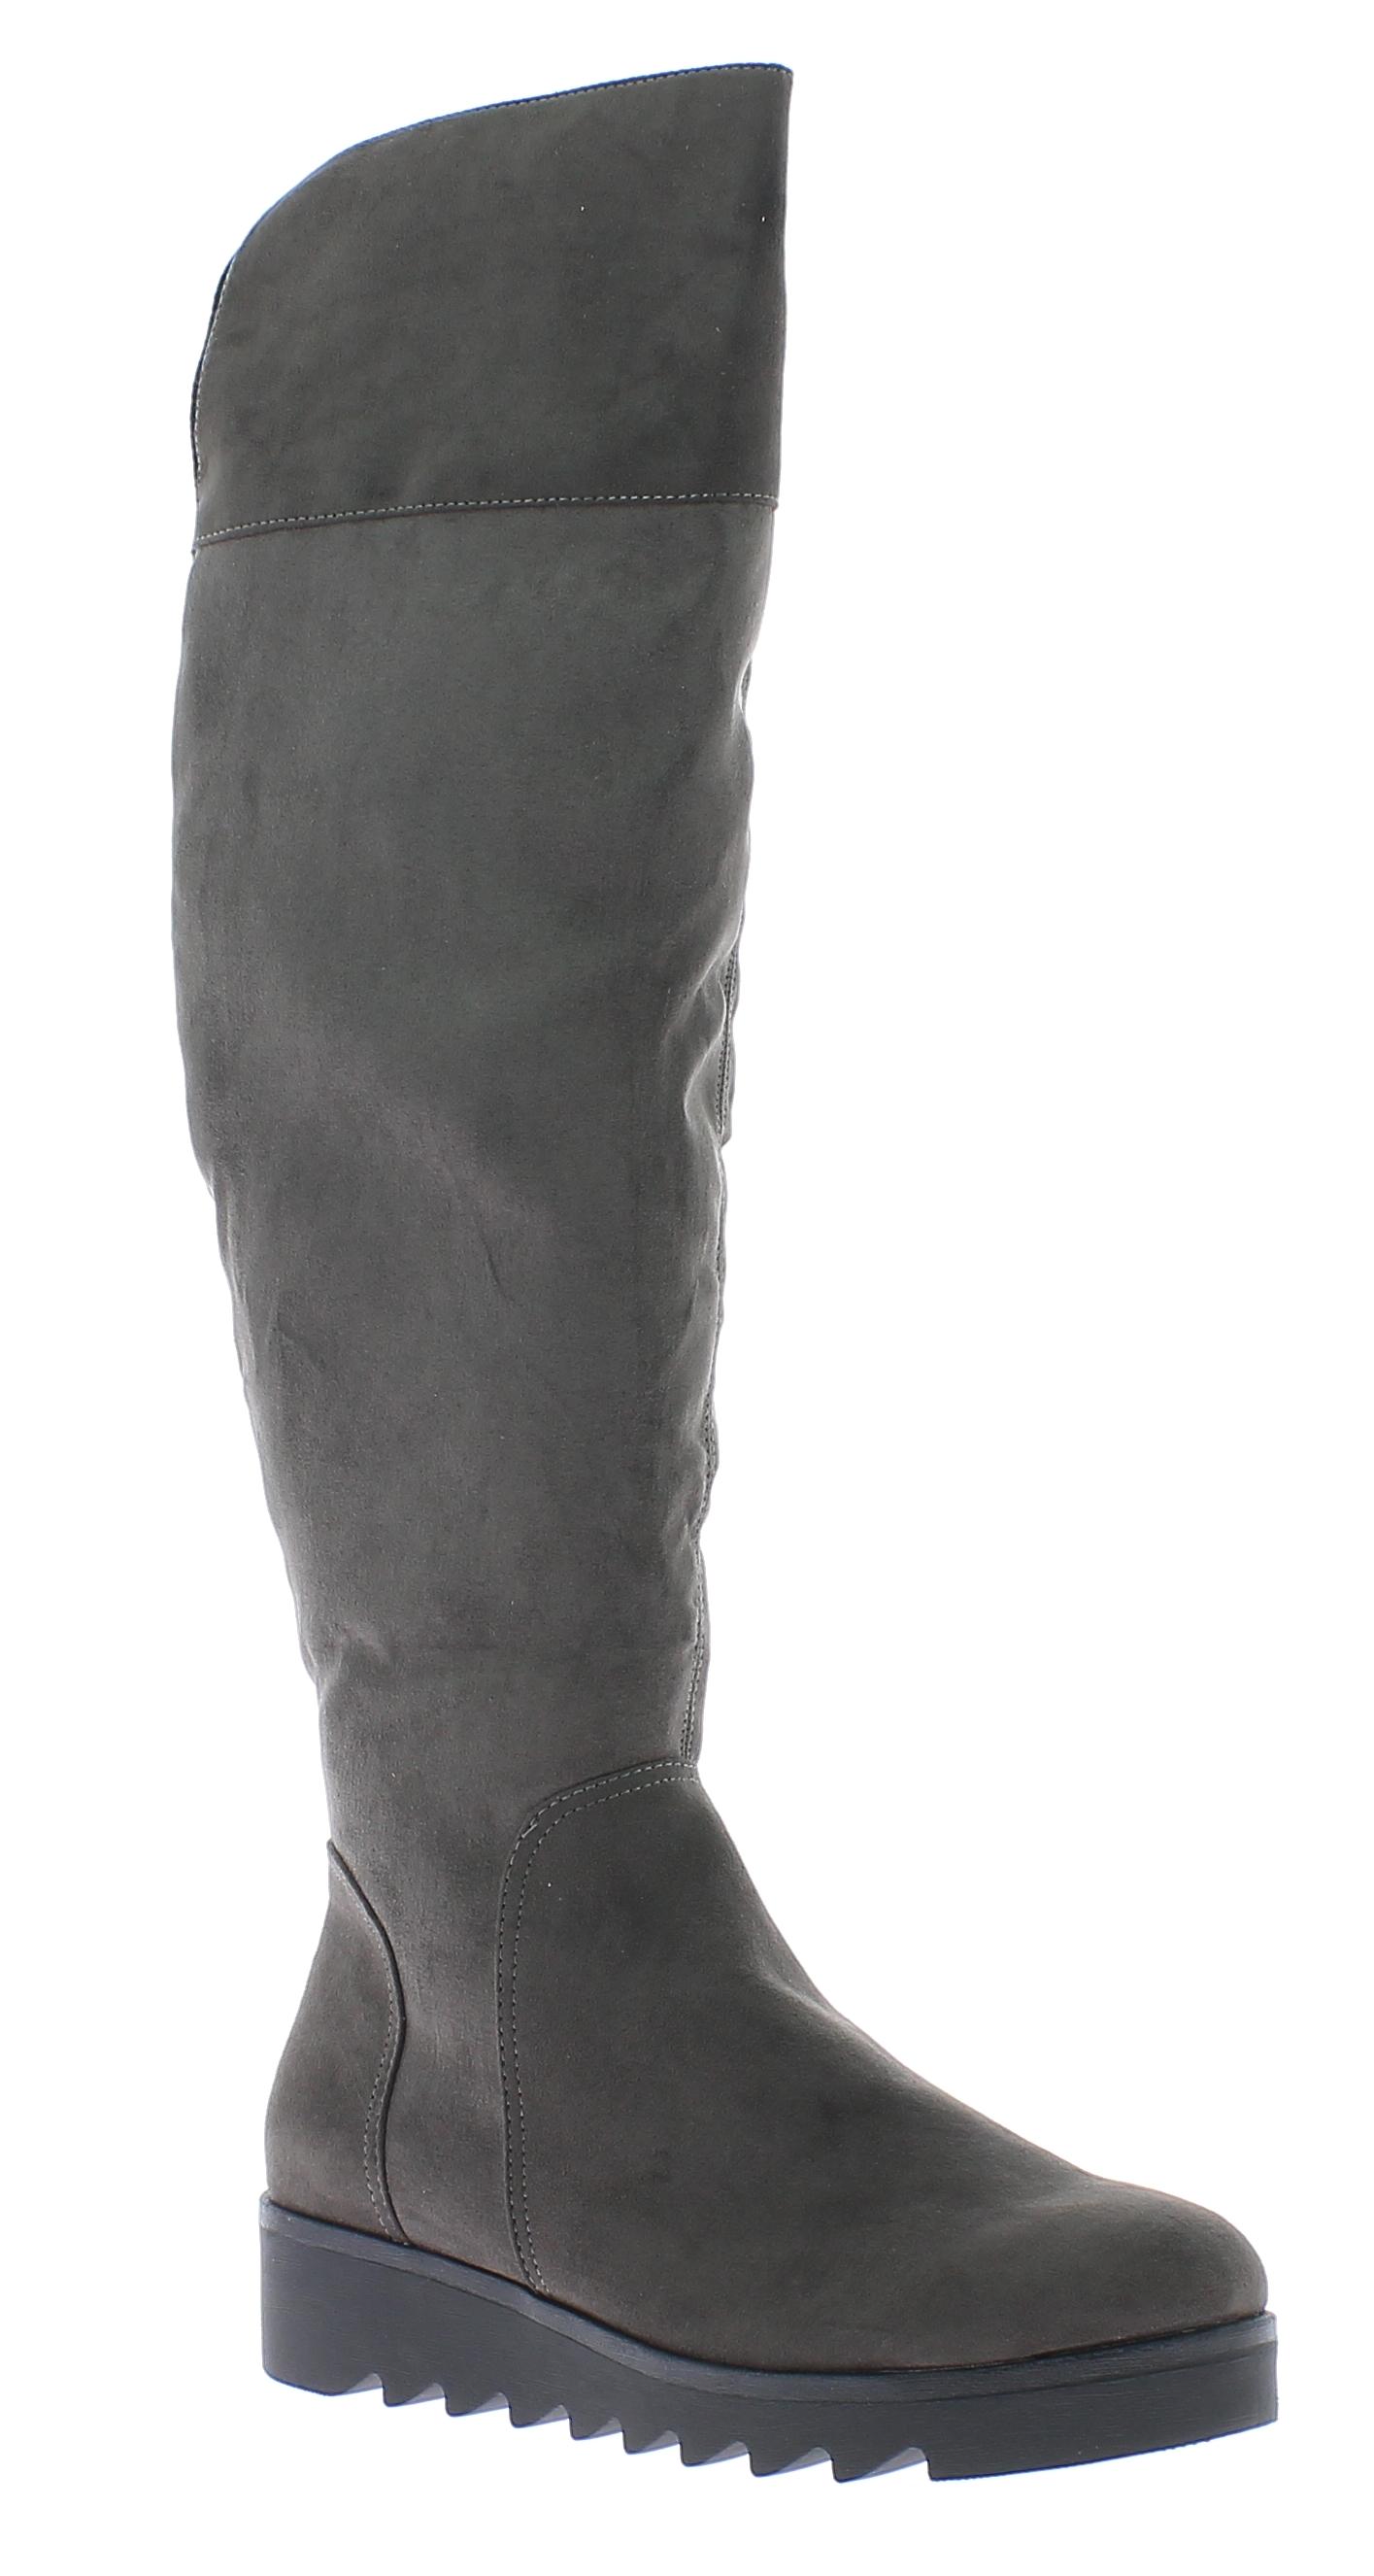 IQSHOES Γυναικεία Μπότα 2411522 Γκρι - IqShoes - 2411522 GREY-grey-37/1/16/27 παπούτσια  γυναικεία μποτάκια